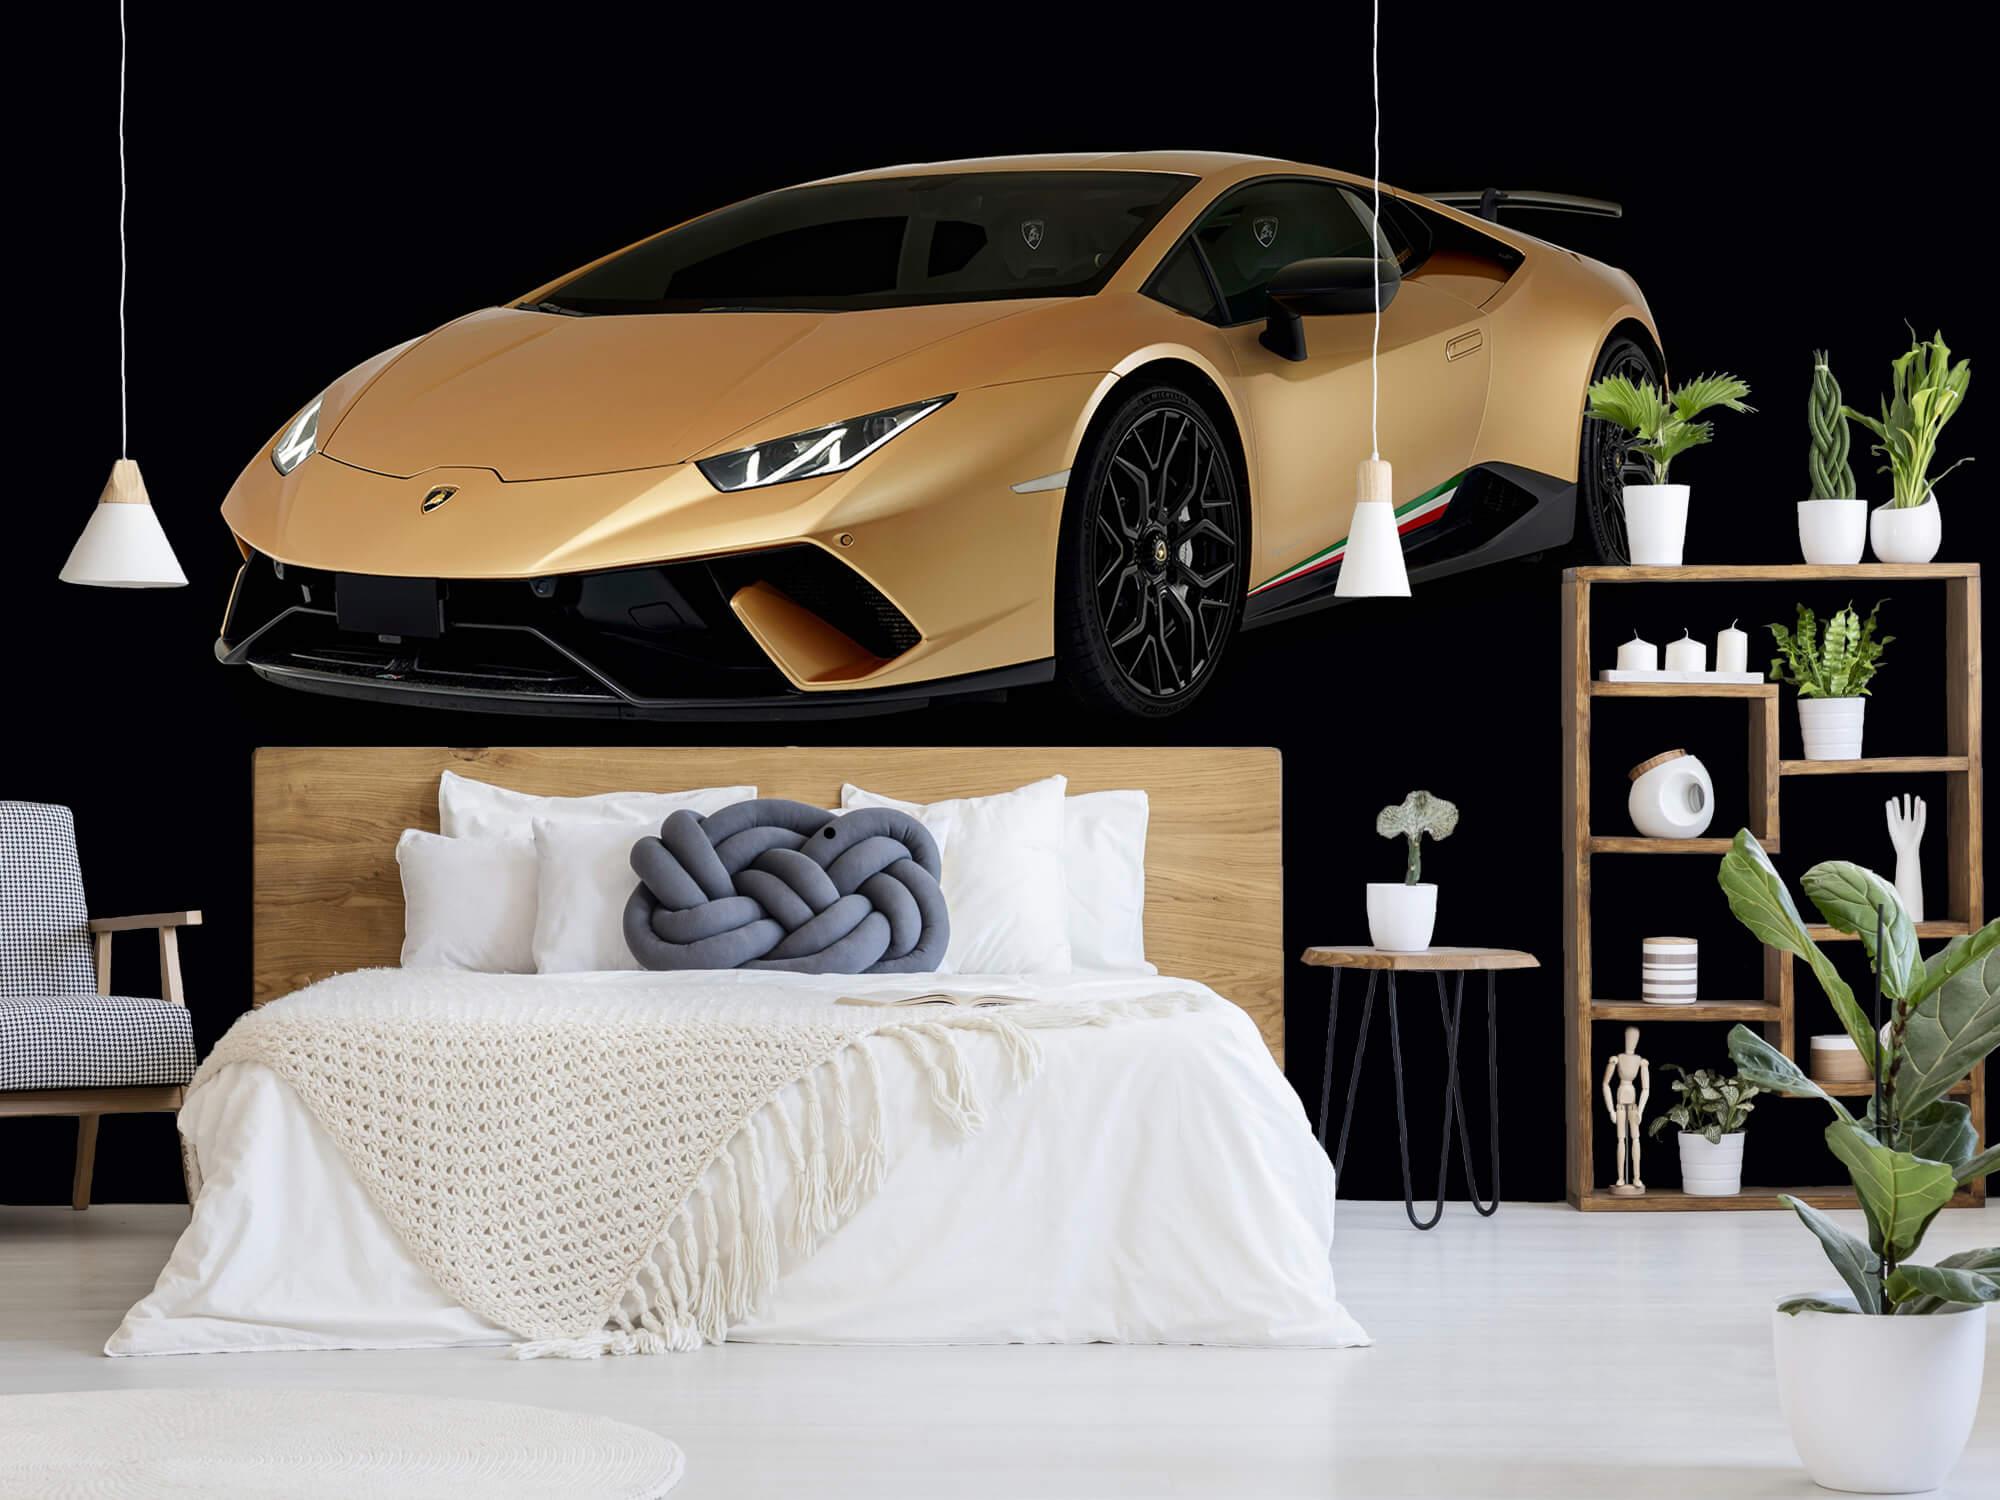 Wallpaper Lamborghini Huracán - Rechter voorkant, zwart 7